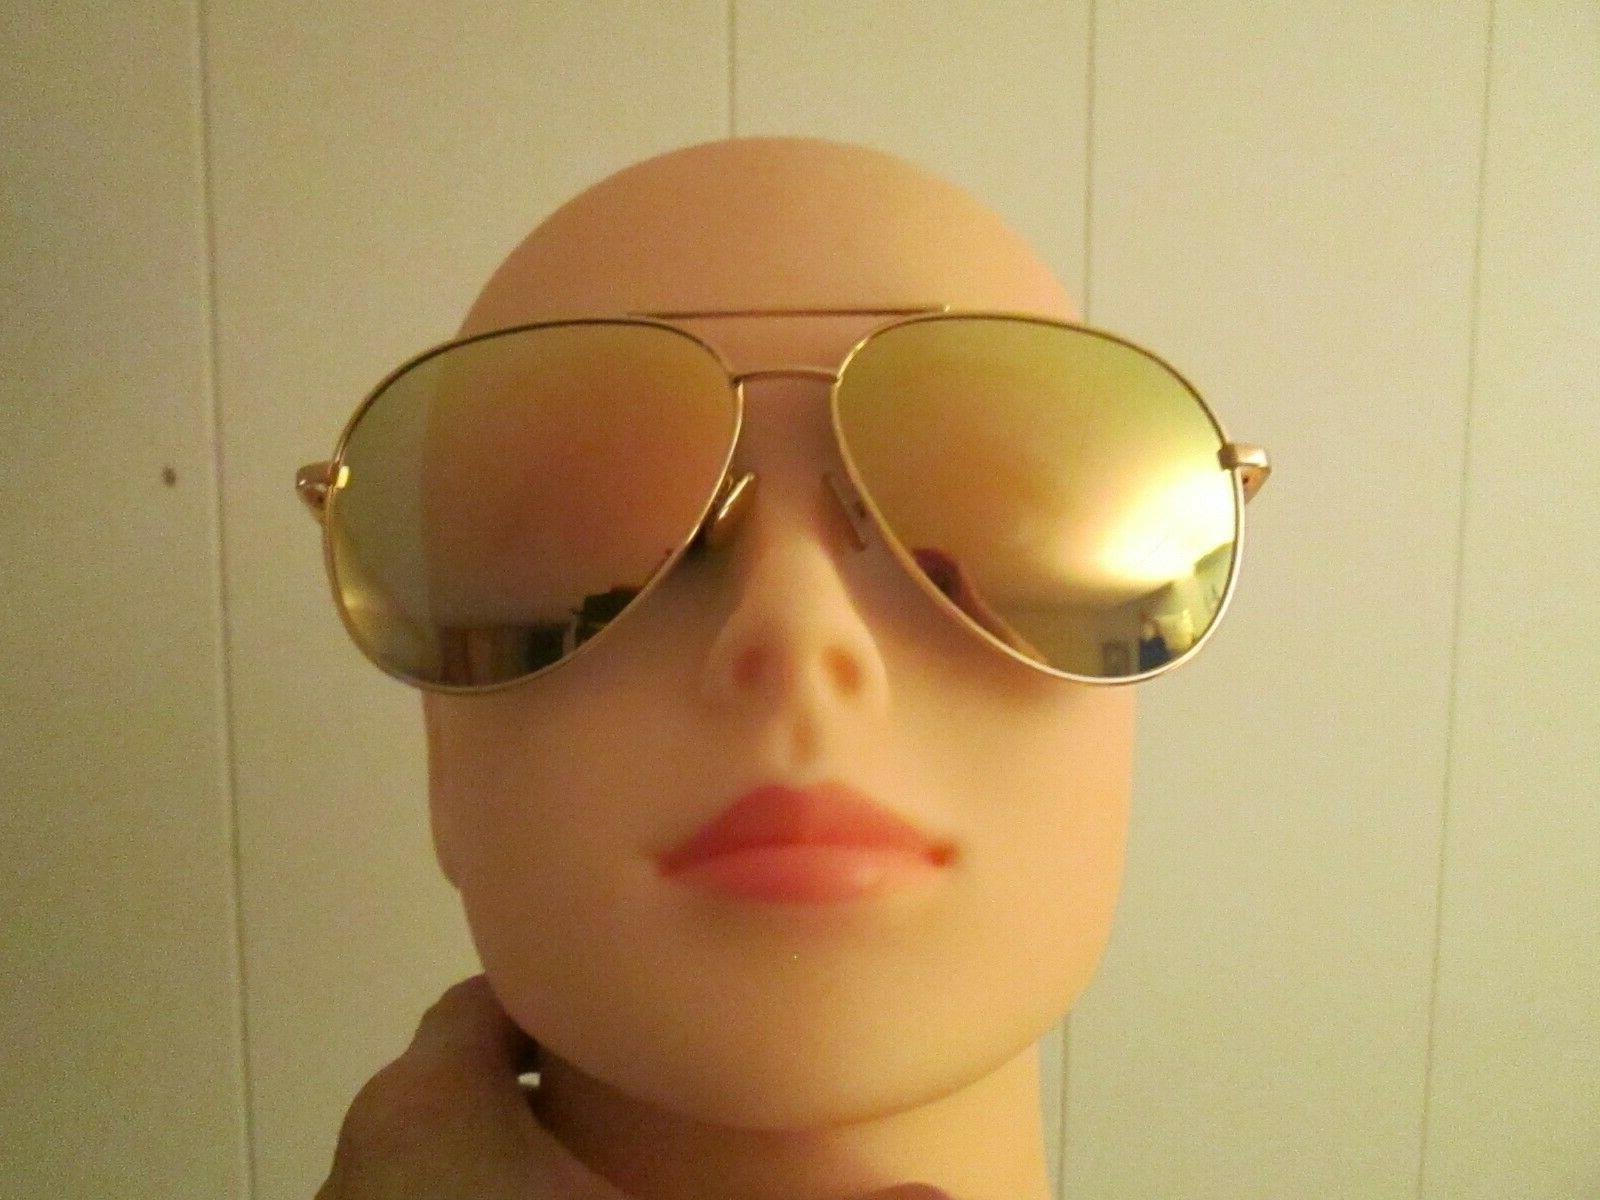 ultra lightweight polarized sunglasses 100 percent uv